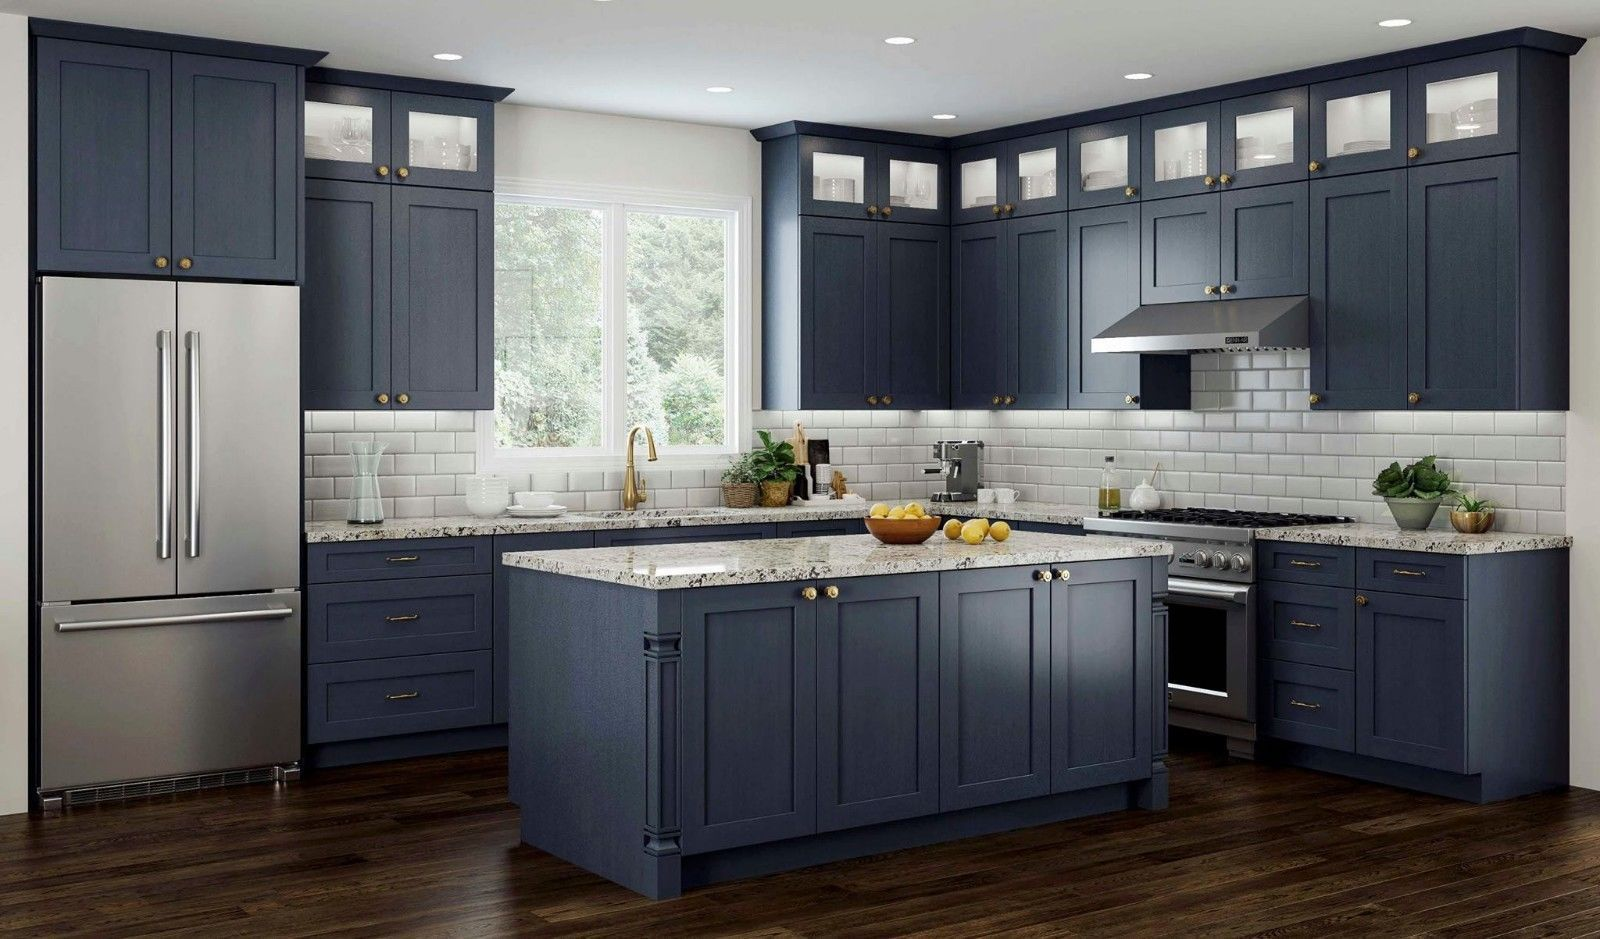 11 x 14 door sample in elegant ocean blue shaker kitchen cabinet vanity cabinets ebay with on kitchen cabinets blue id=40868